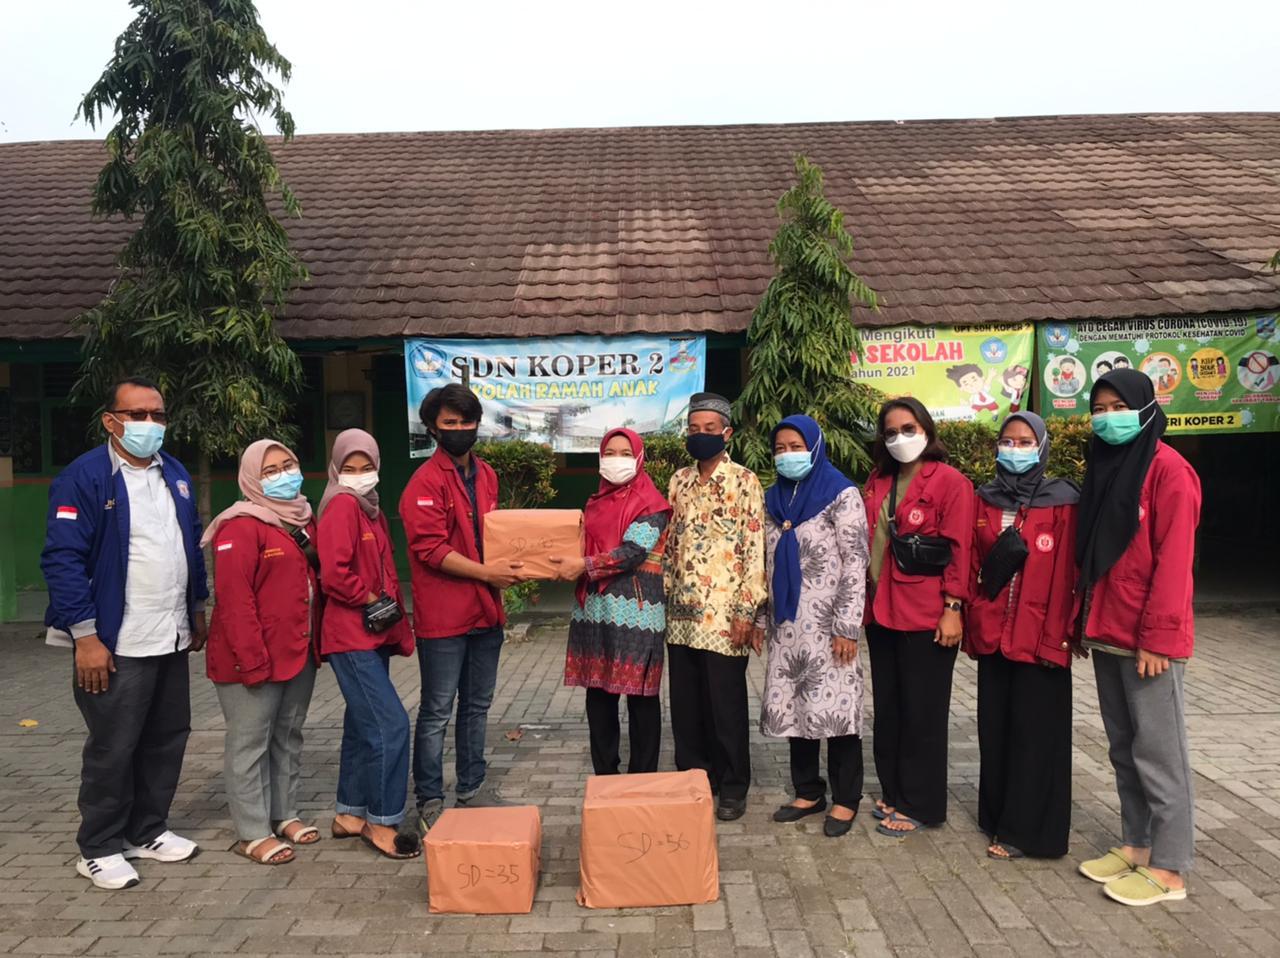 Gambar Donasi Buku Bacaan Untuk 3 SDN dan 1 PAUD di Desa Koper 13